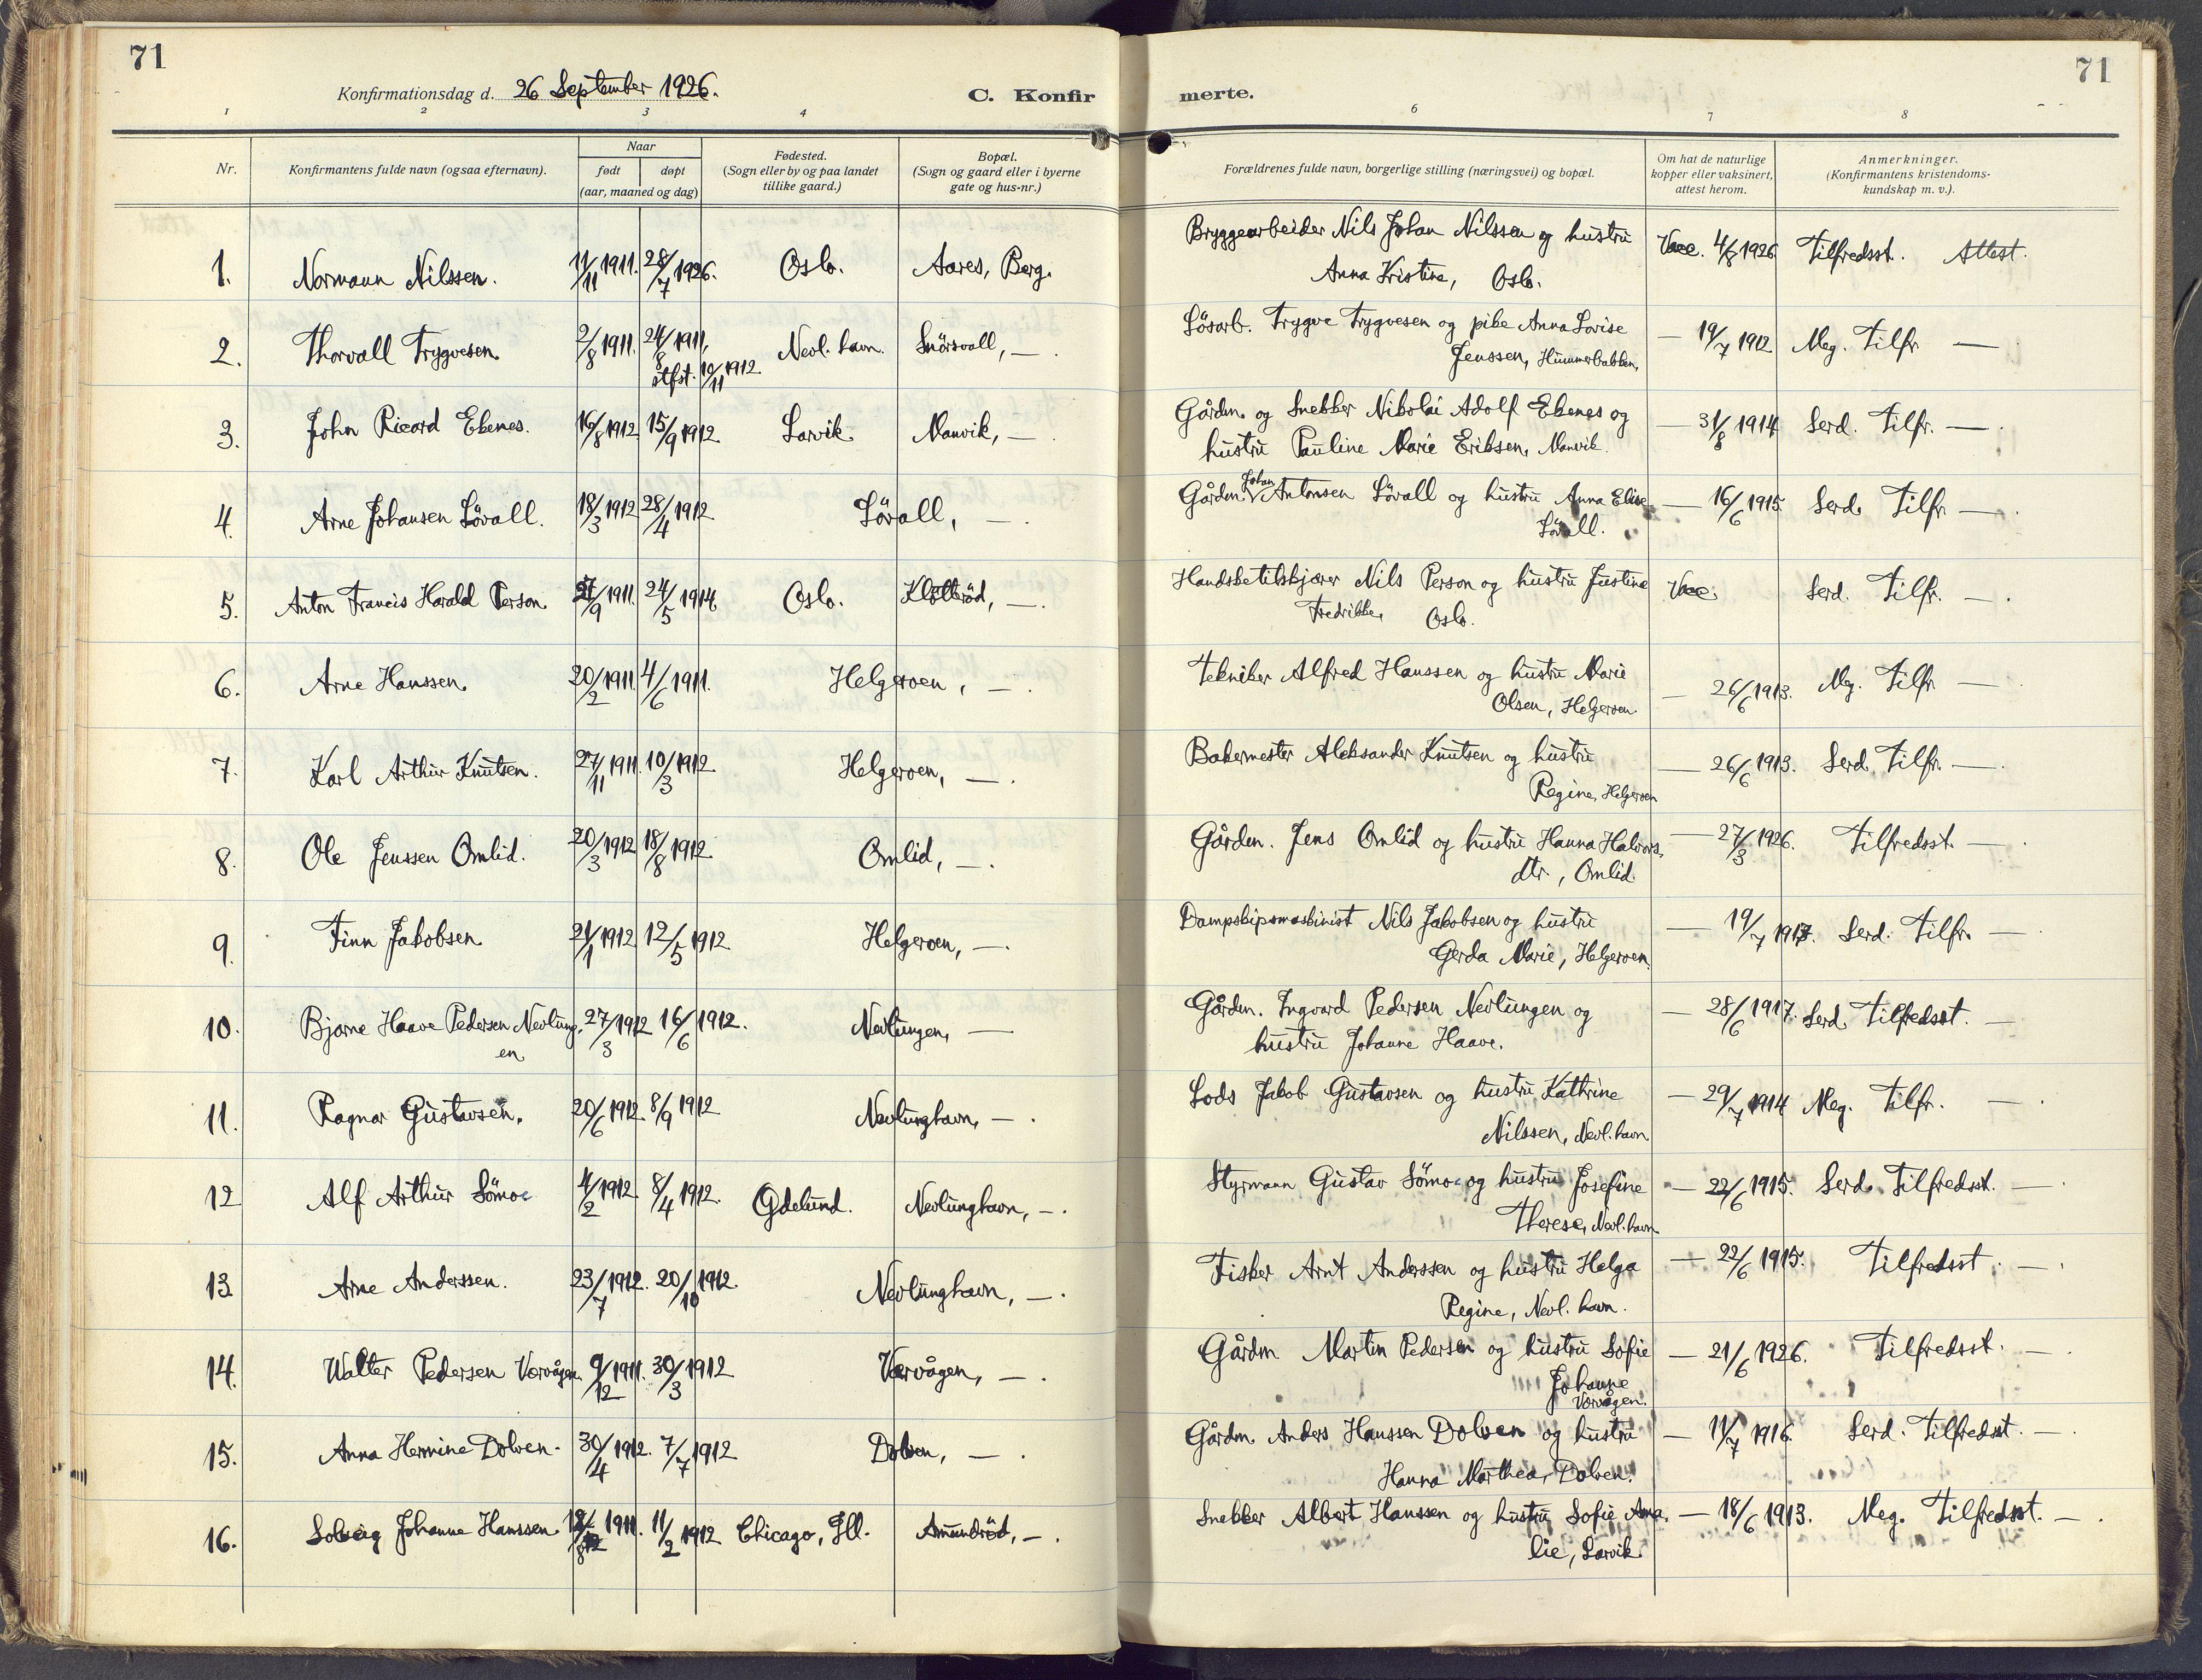 SAKO, Brunlanes kirkebøker, F/Fb/L0004: Ministerialbok nr. II 4, 1923-1940, s. 71